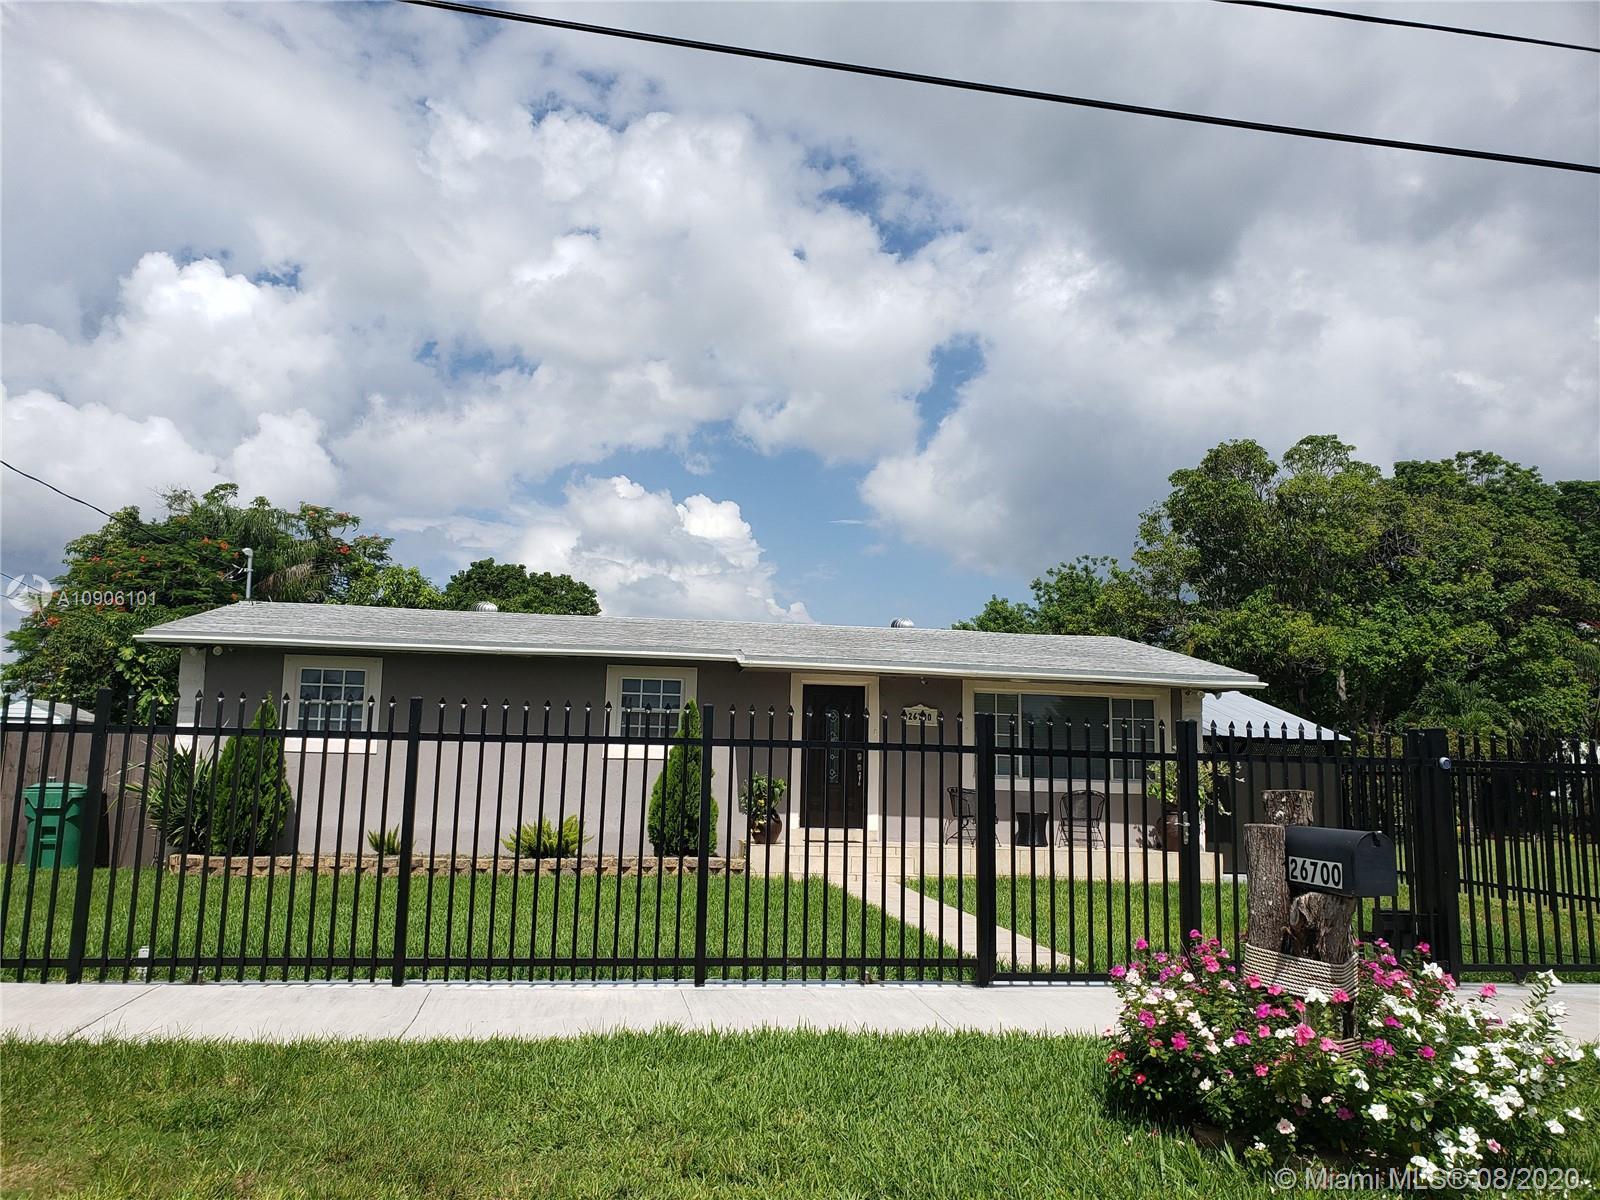 26700 SW 138 Avenue Property Photo